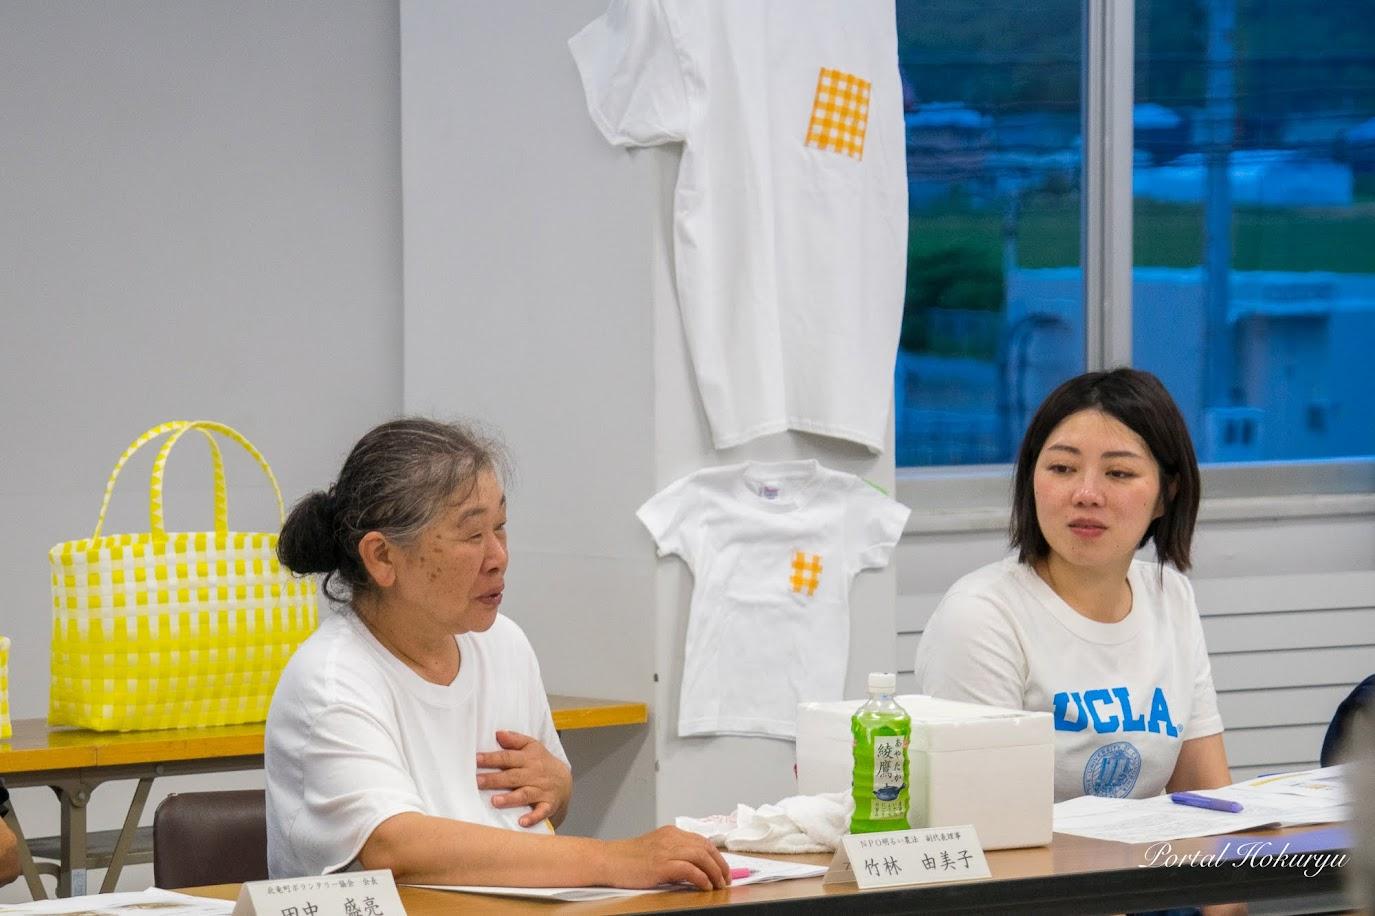 NPO明るい農法・竹林由美子 副代表理事